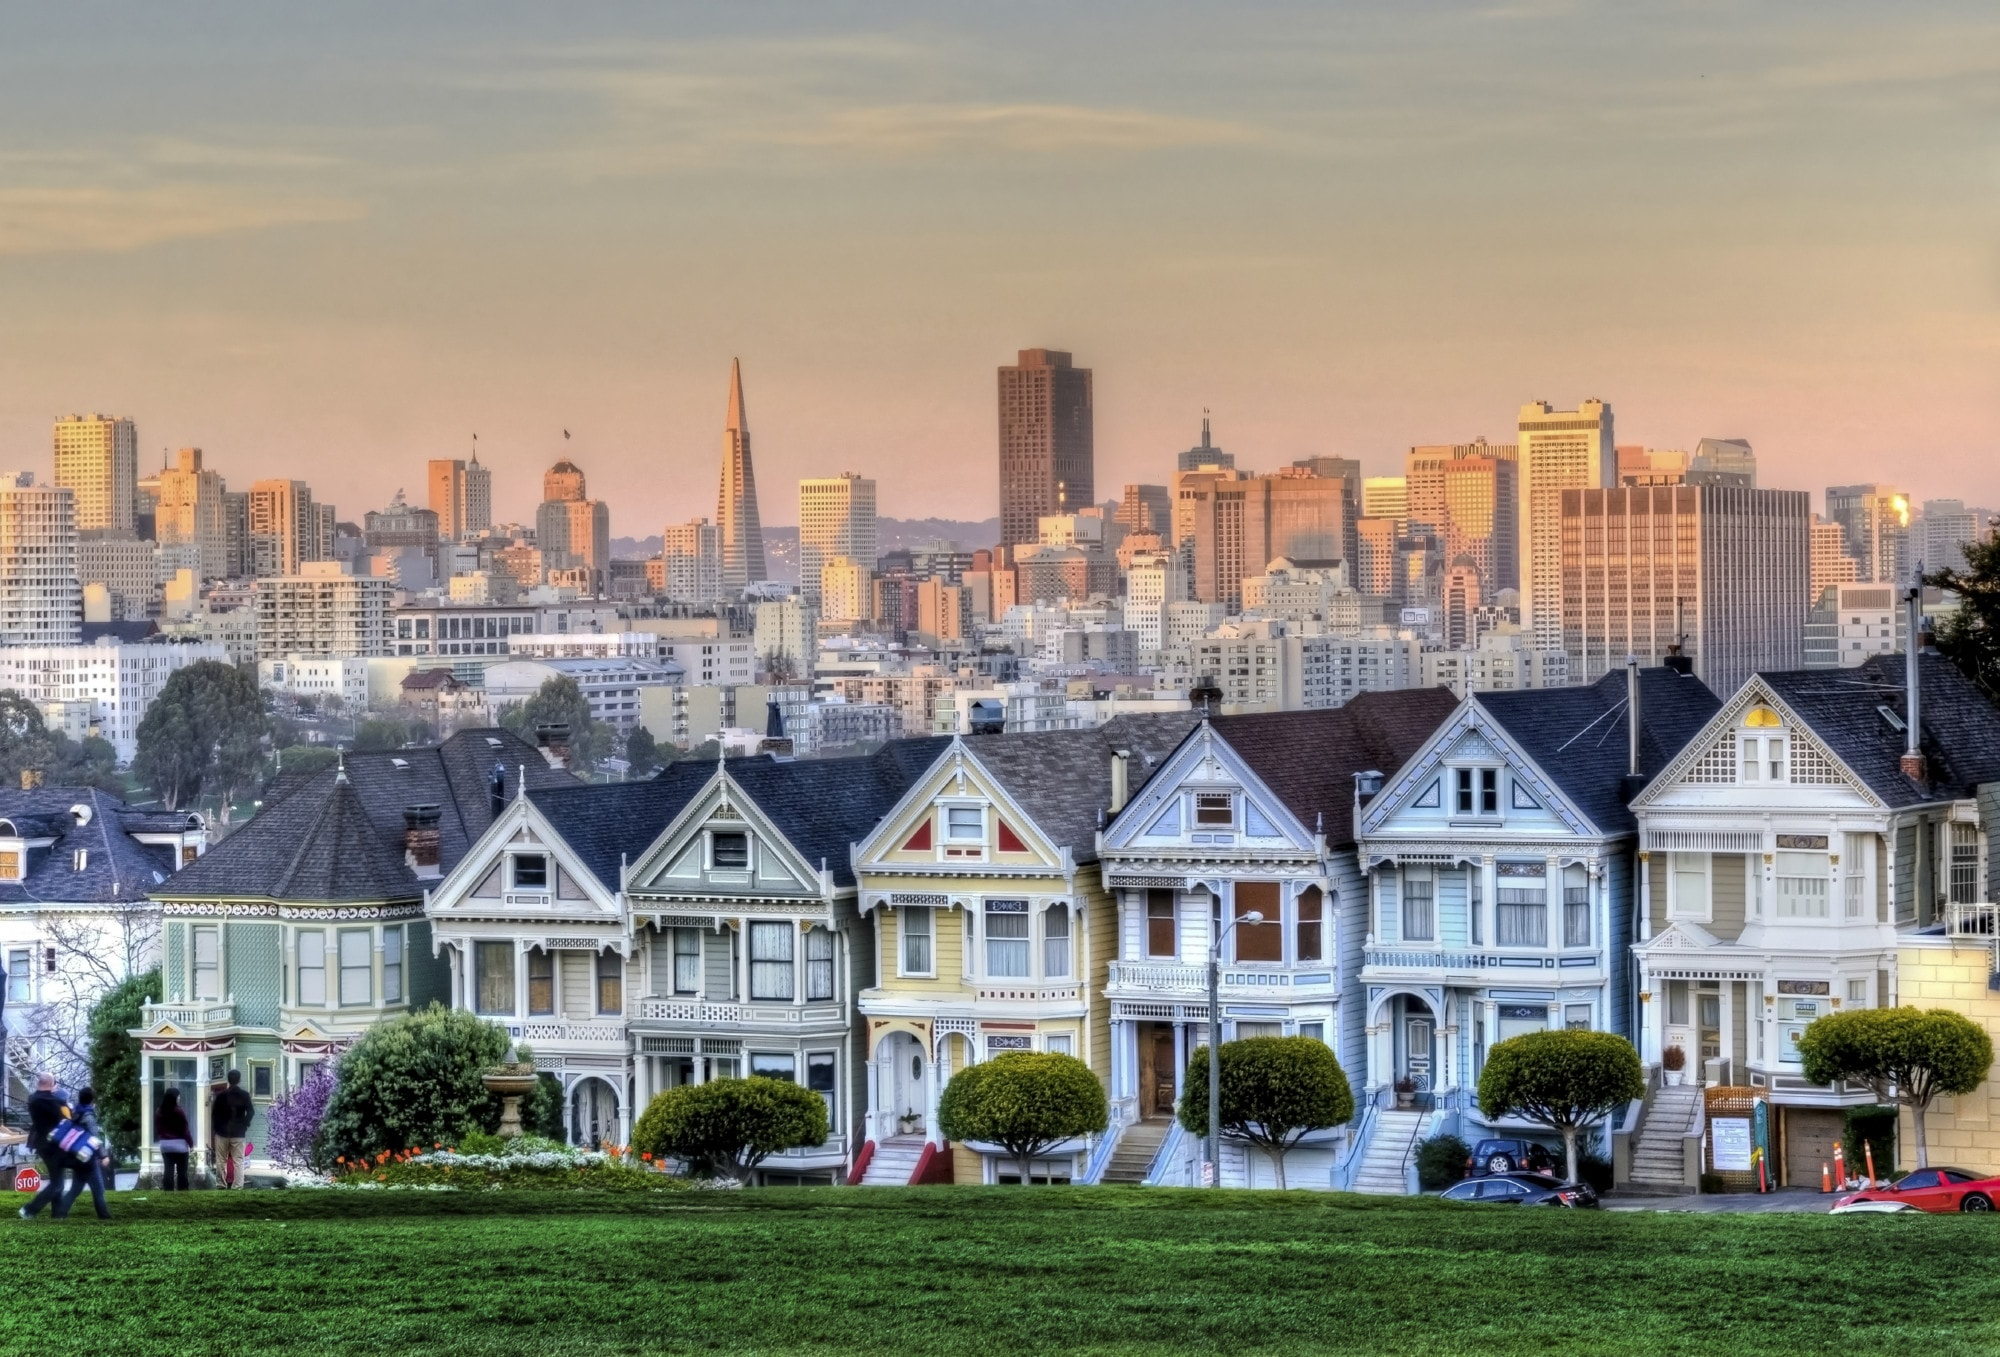 Destinations_USA_CAlifornia_San-Francisco_Painted-Ladies_iStock_000028126030_Large